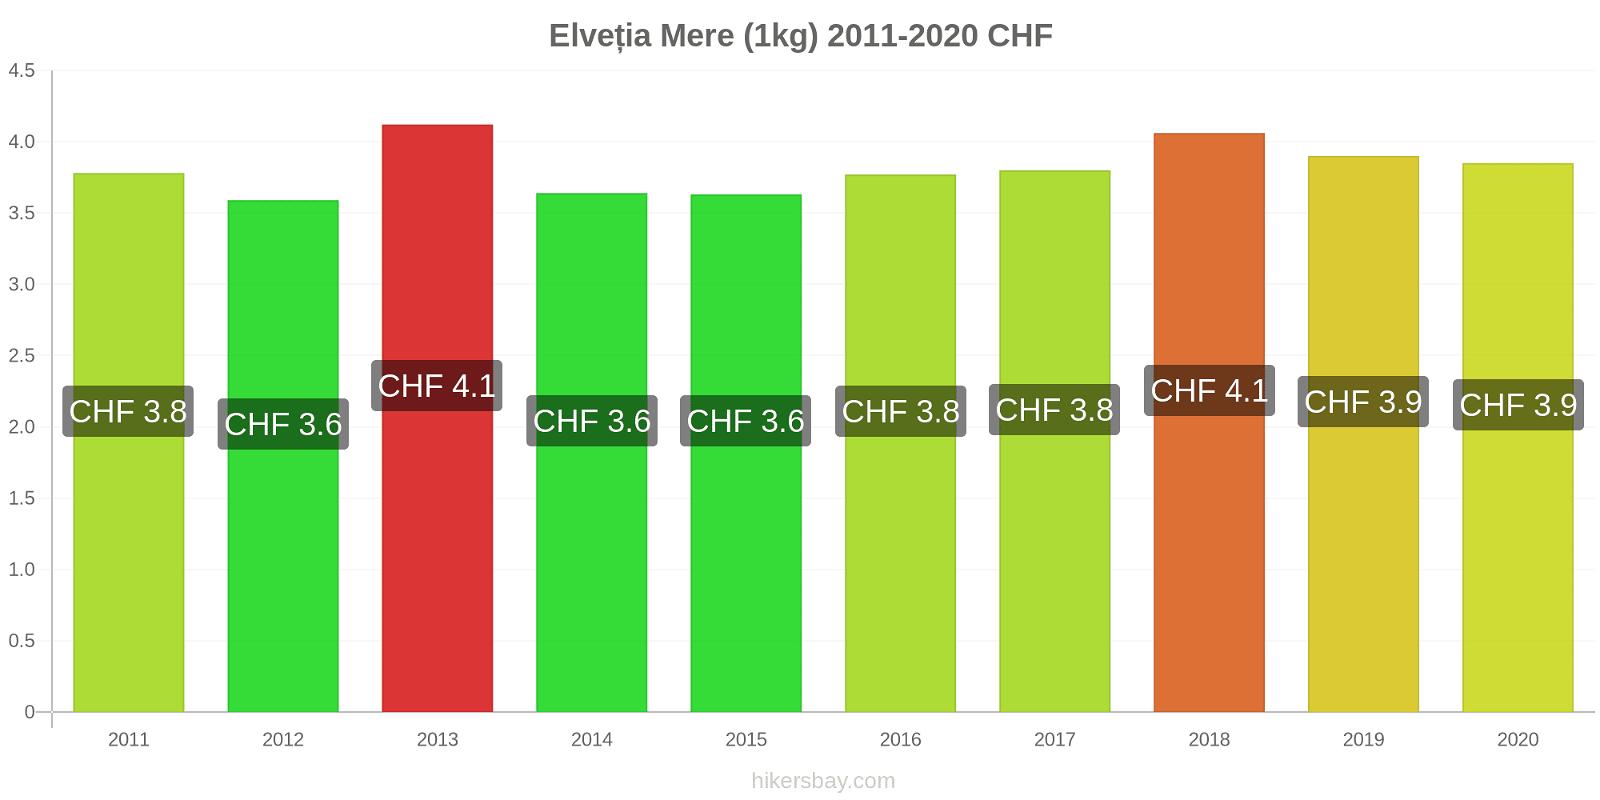 Elveția modificări de preț Mere (1kg) hikersbay.com